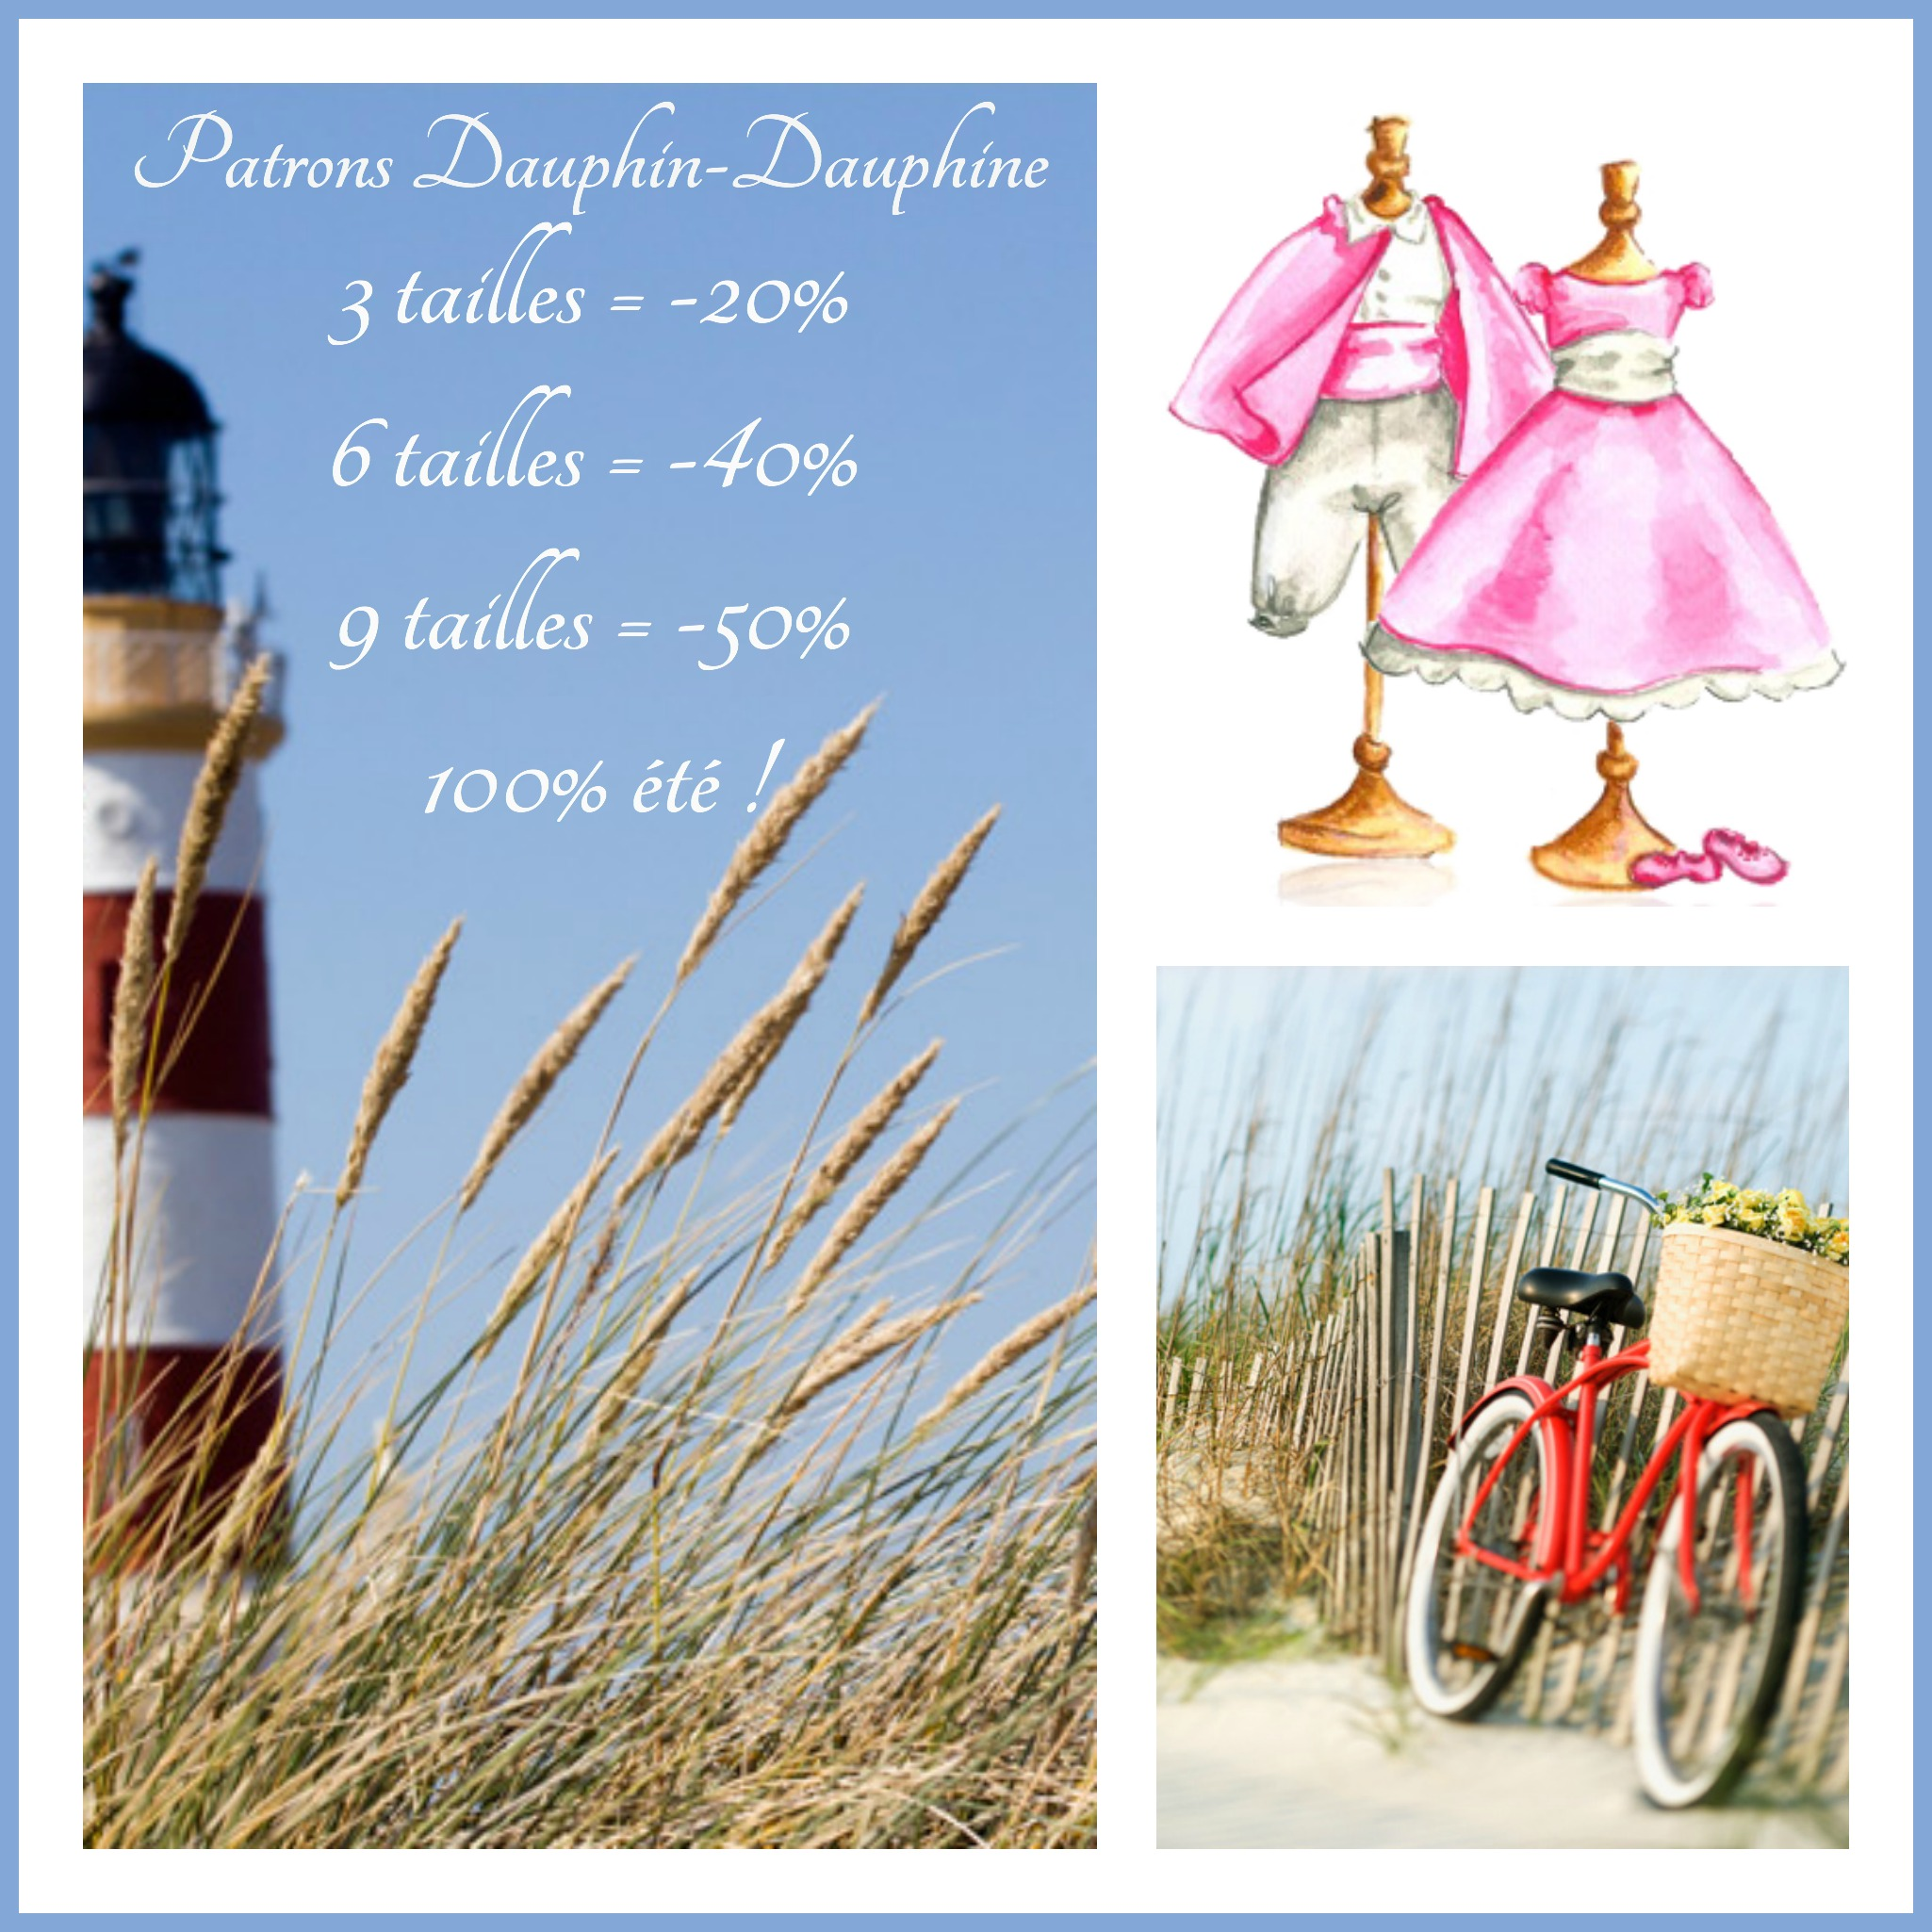 offre spéciale Dauphin-Dauphine